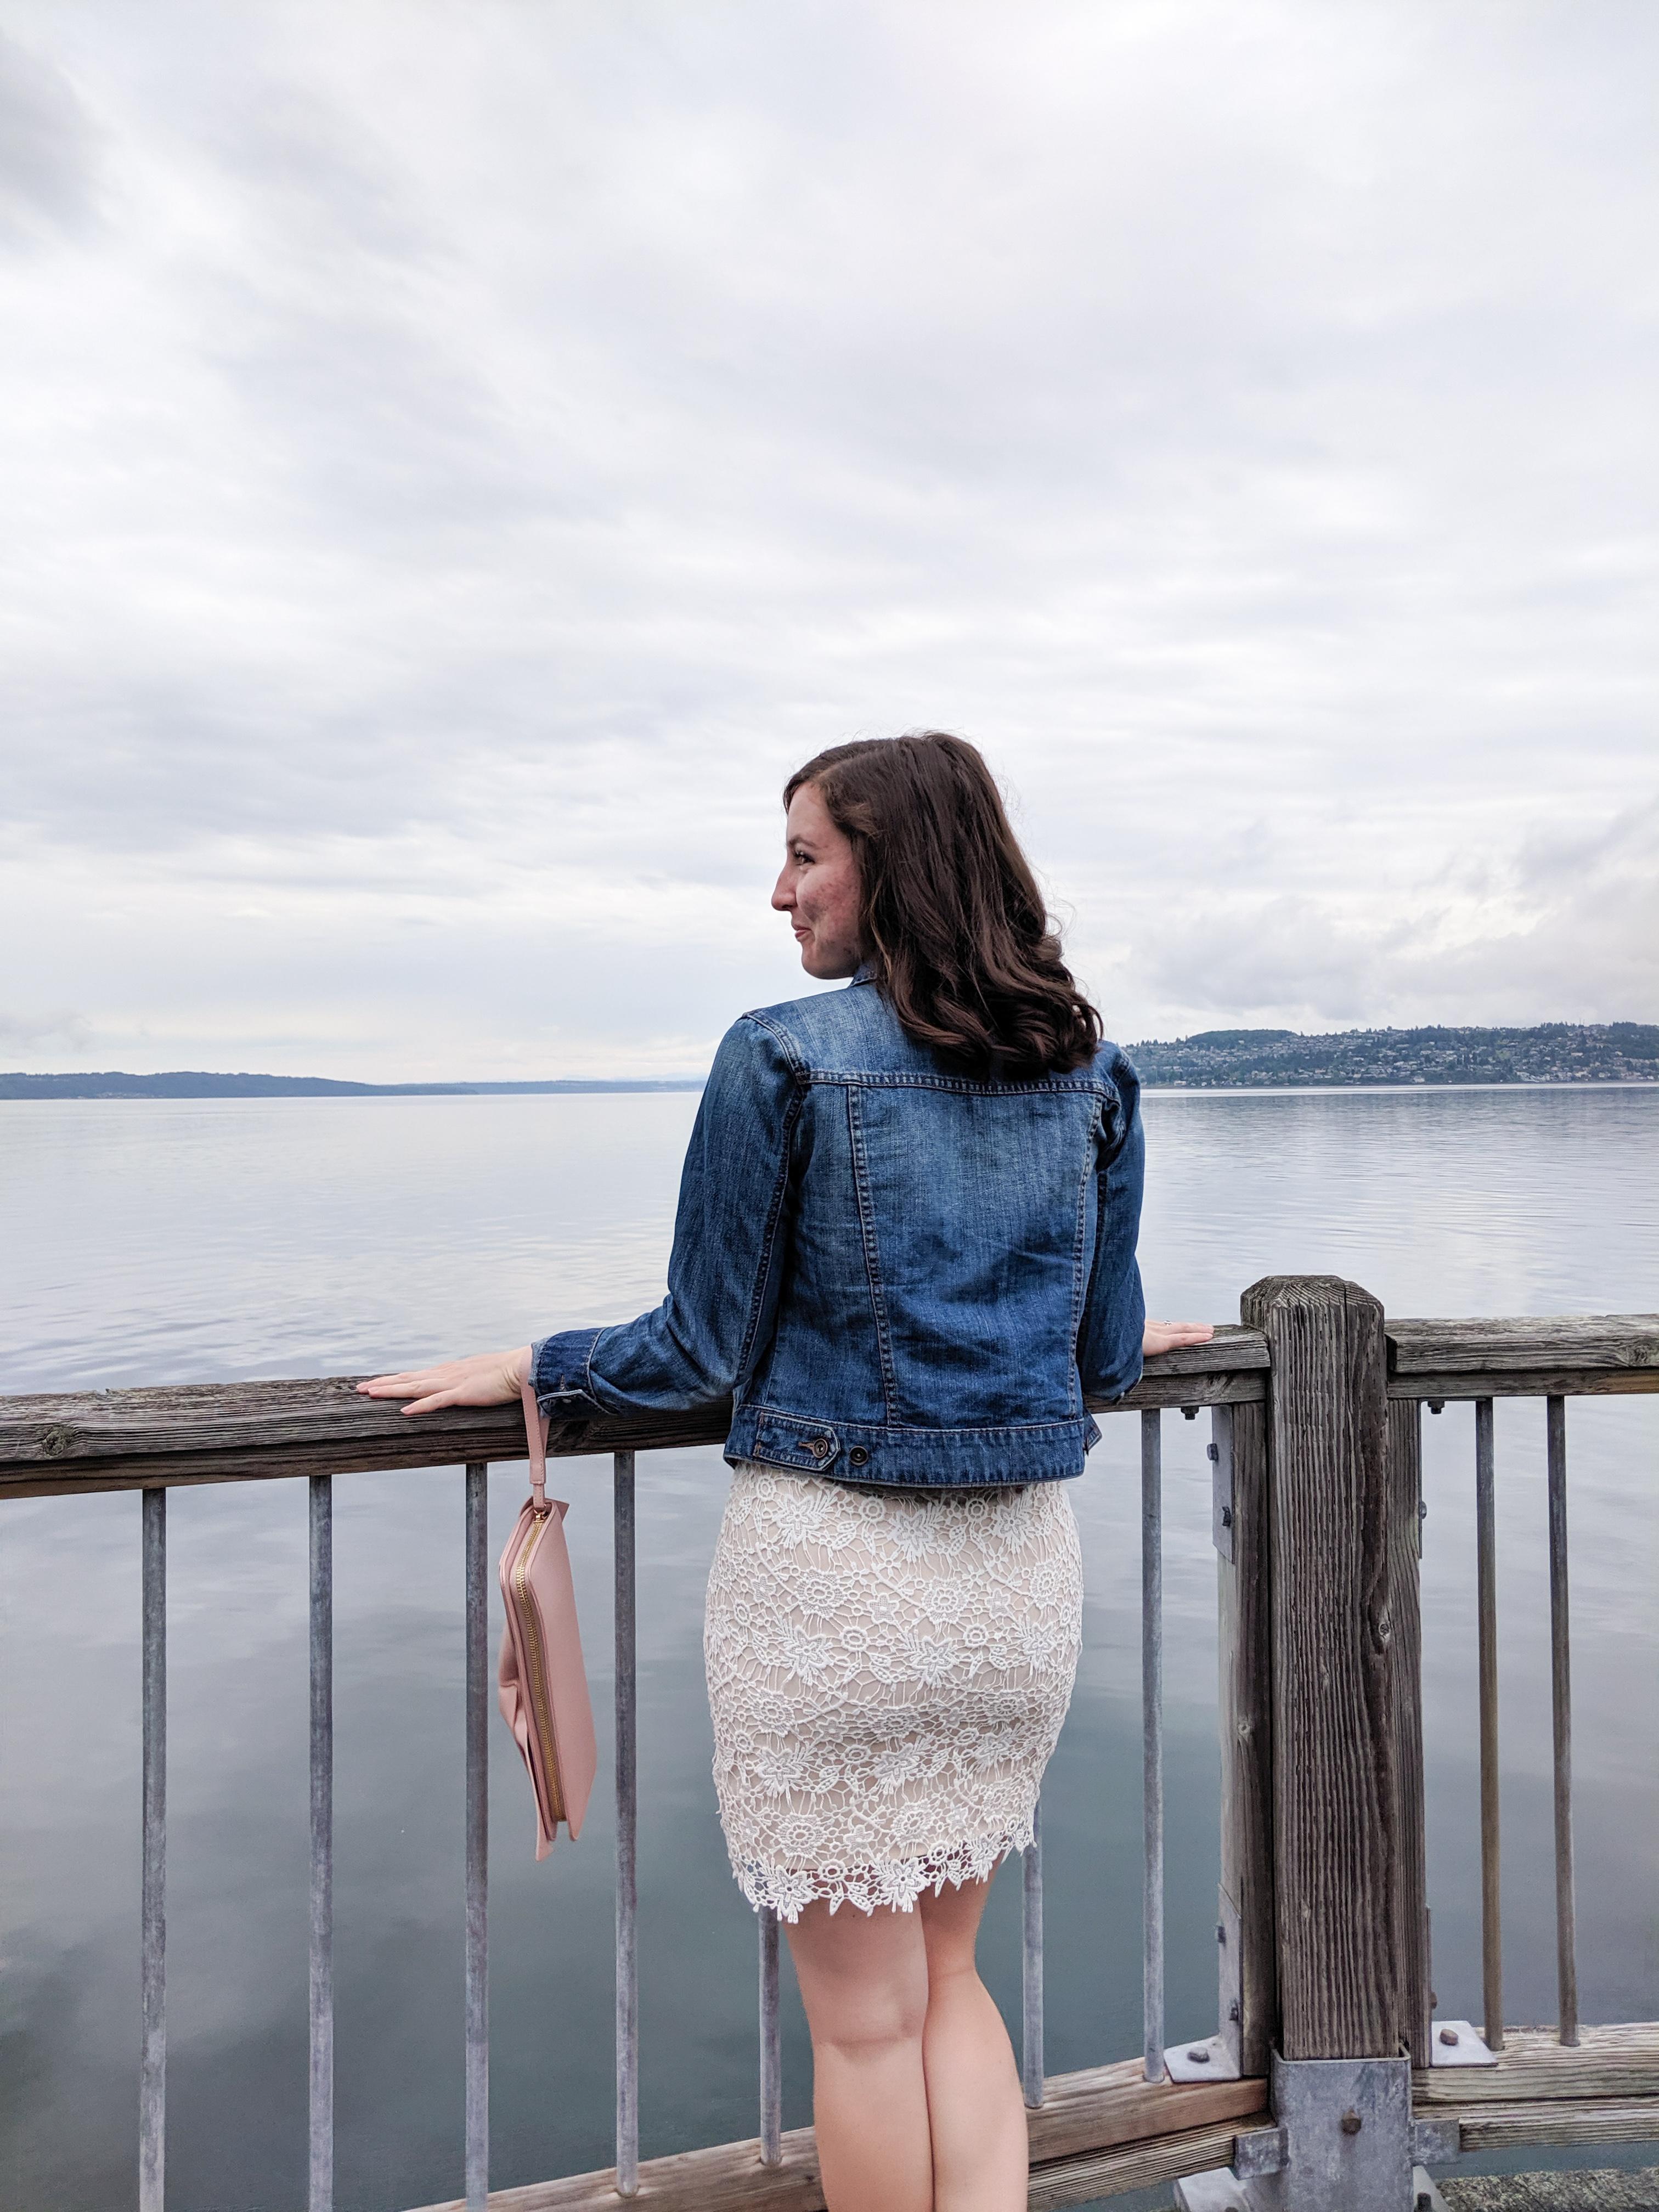 white lace dress, jean jacket, Puget Sound